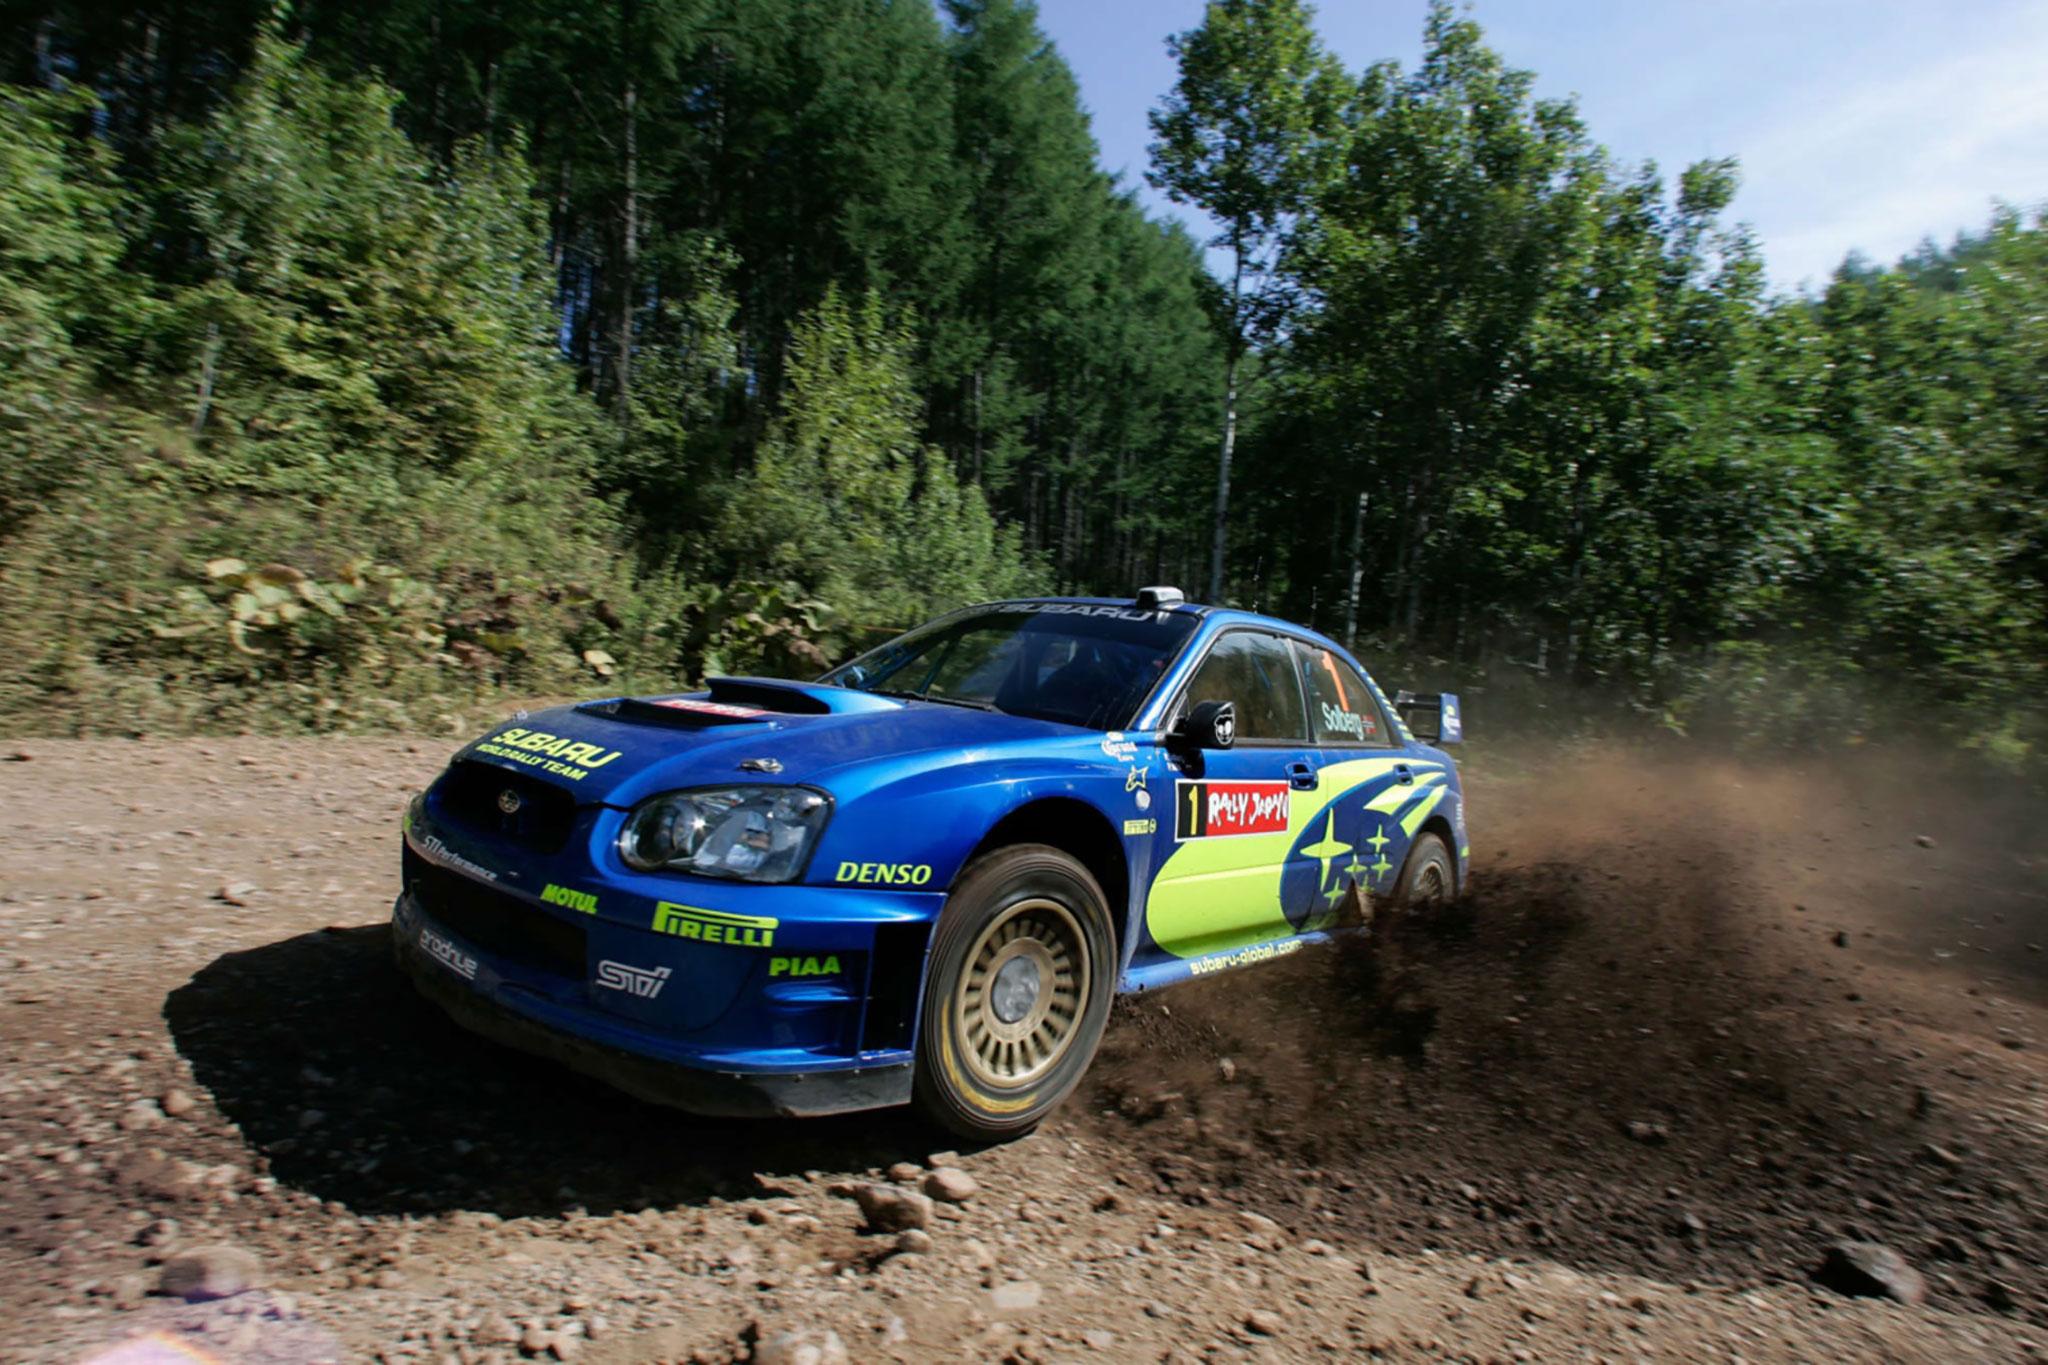 2004 Subaru Impreza S10 WRC Rallye du Japon en 2004.